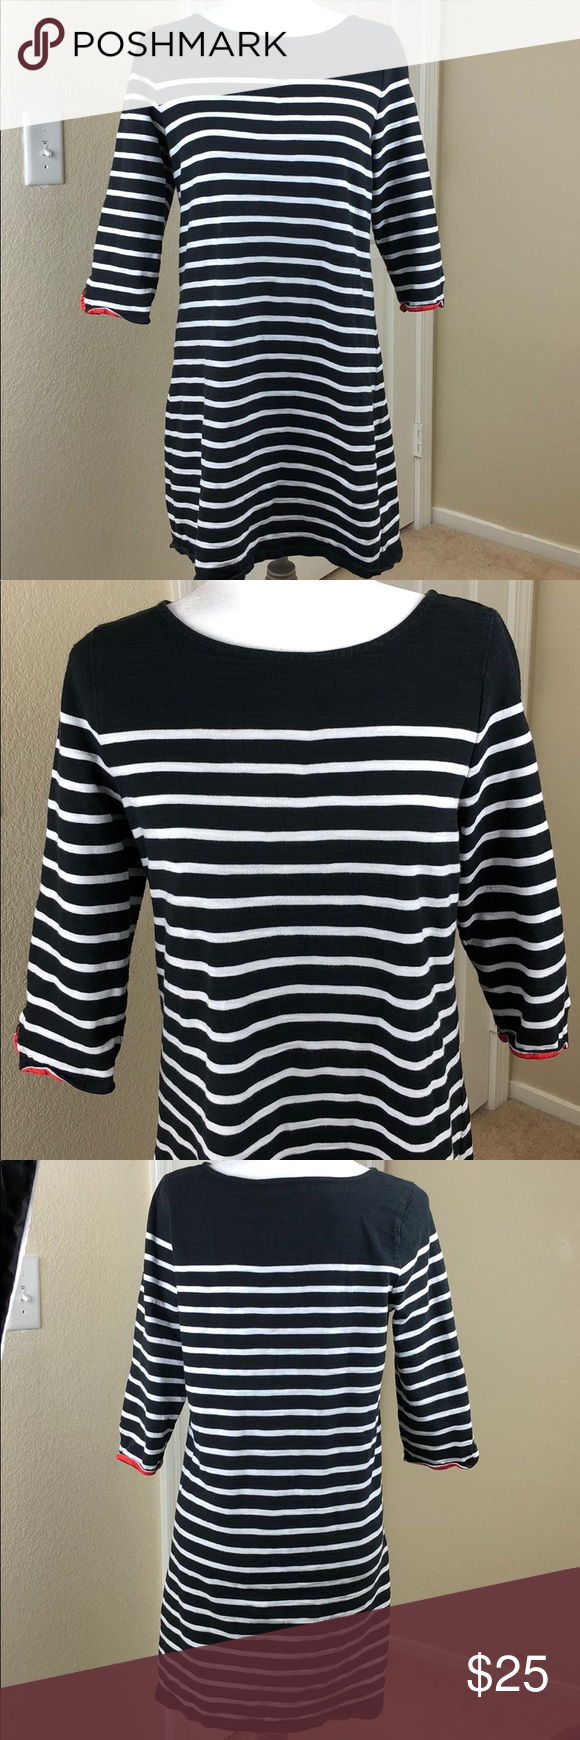 Talbots Petites Striped Black White Shirt Dress Lp Black And White Shirt Black White Shirt Dress White Shirt Dress [ 1740 x 580 Pixel ]